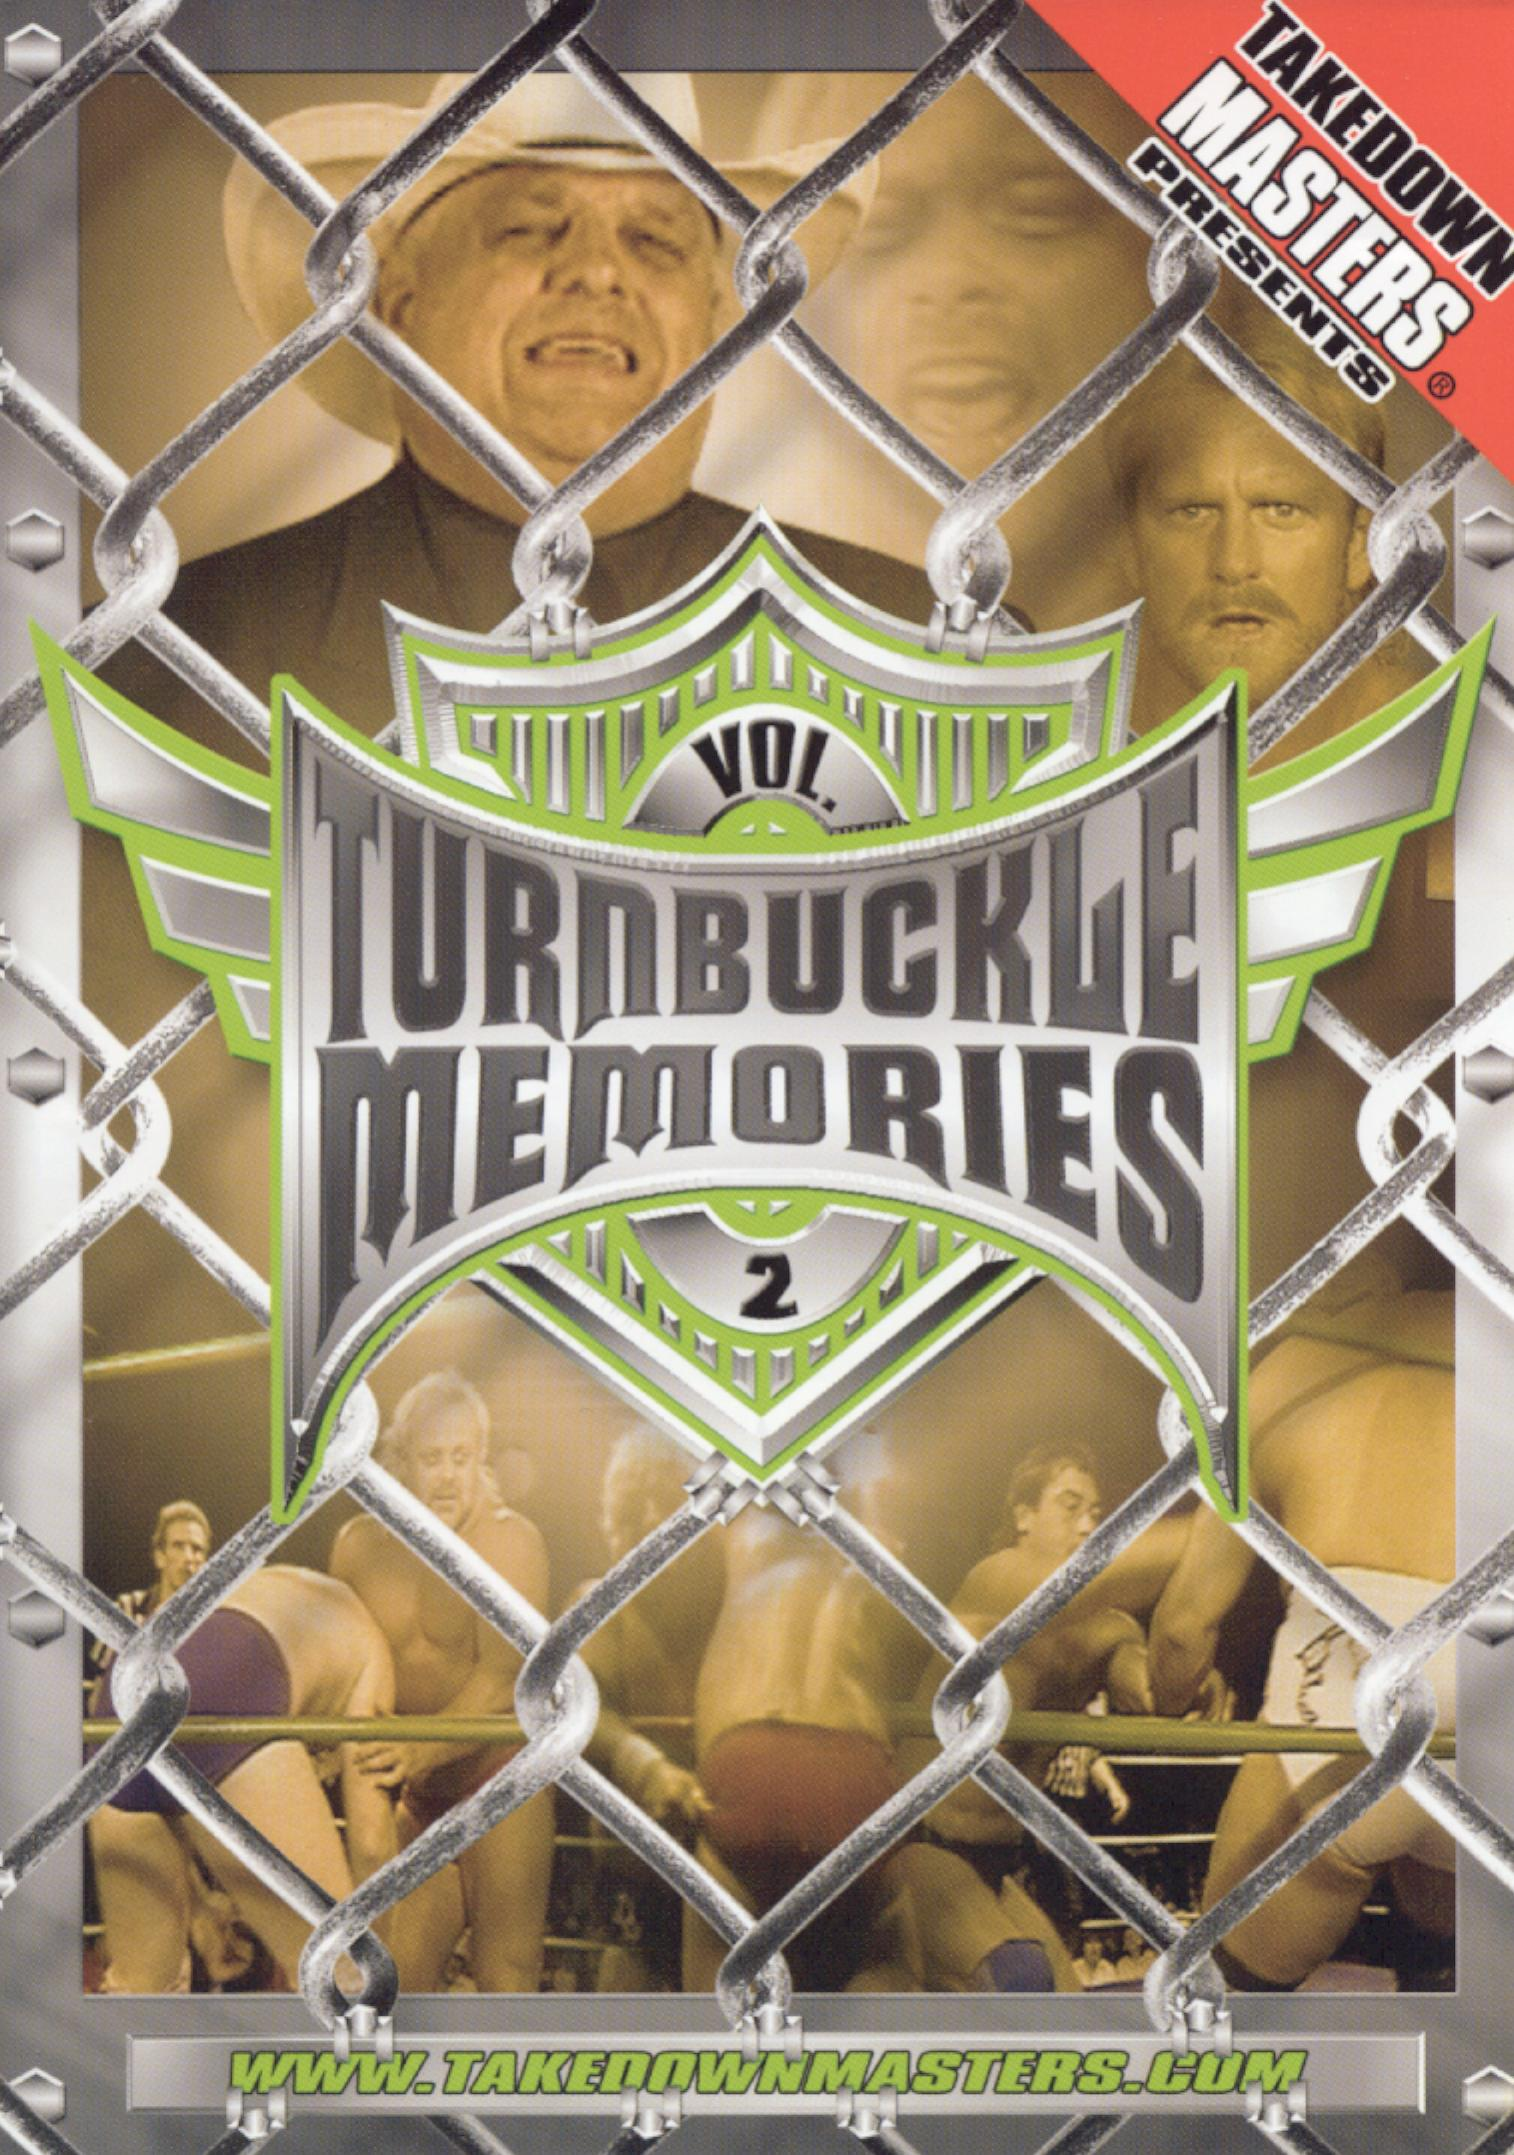 Takedown Masters: Turnbuckle Memories, Vol. 2